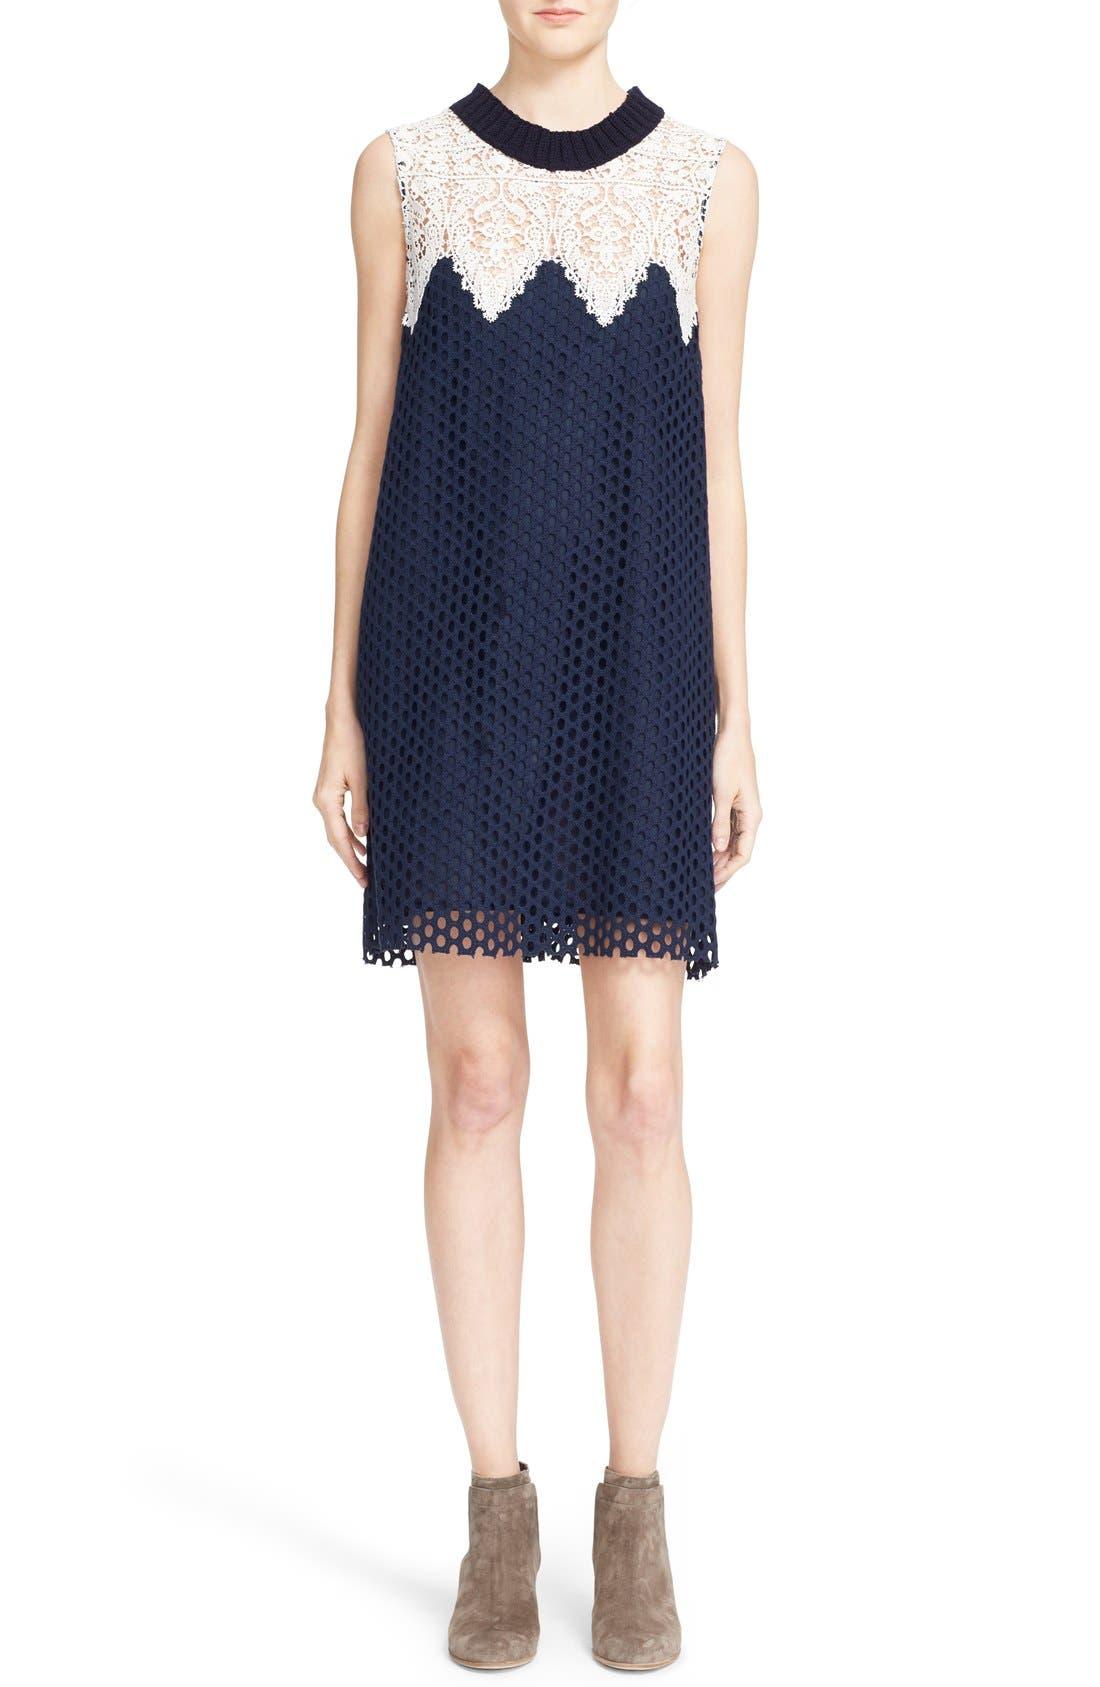 Alternate Image 1 Selected - Sea Sleeveless Cotton Lace Dress